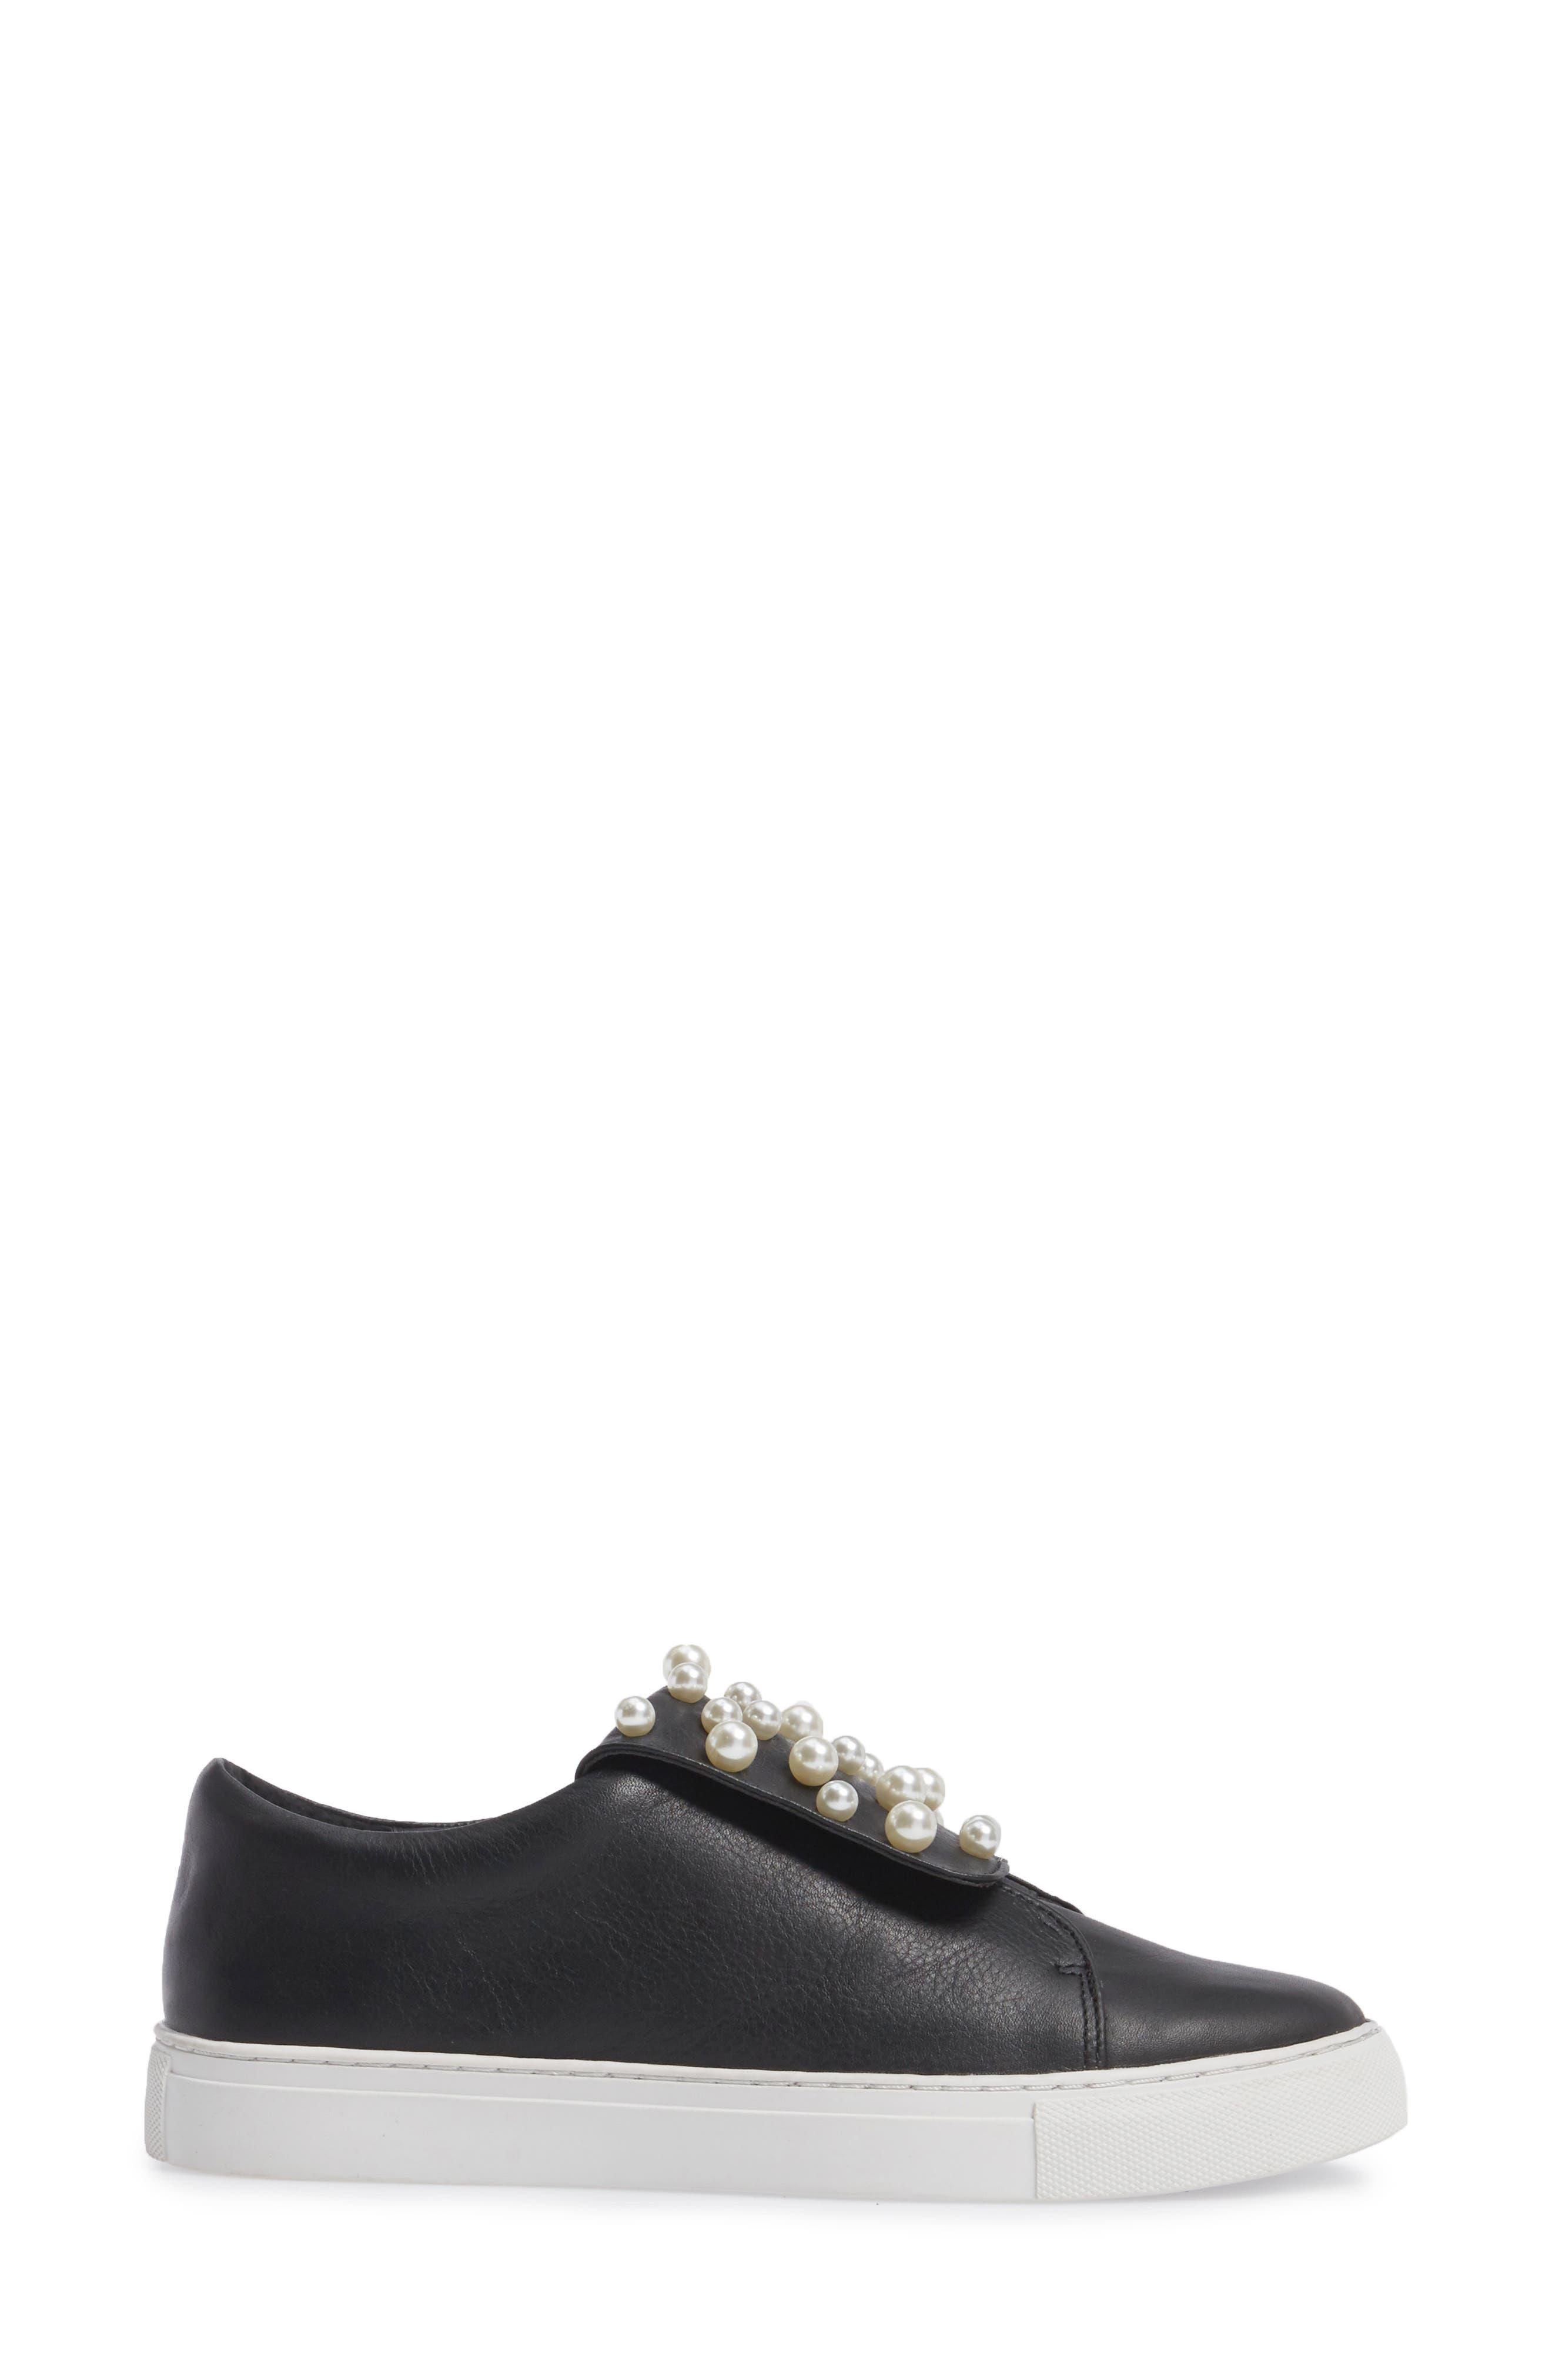 Hadi Imitation Pearl Embellished Platorm Sneaker,                             Alternate thumbnail 3, color,                             001